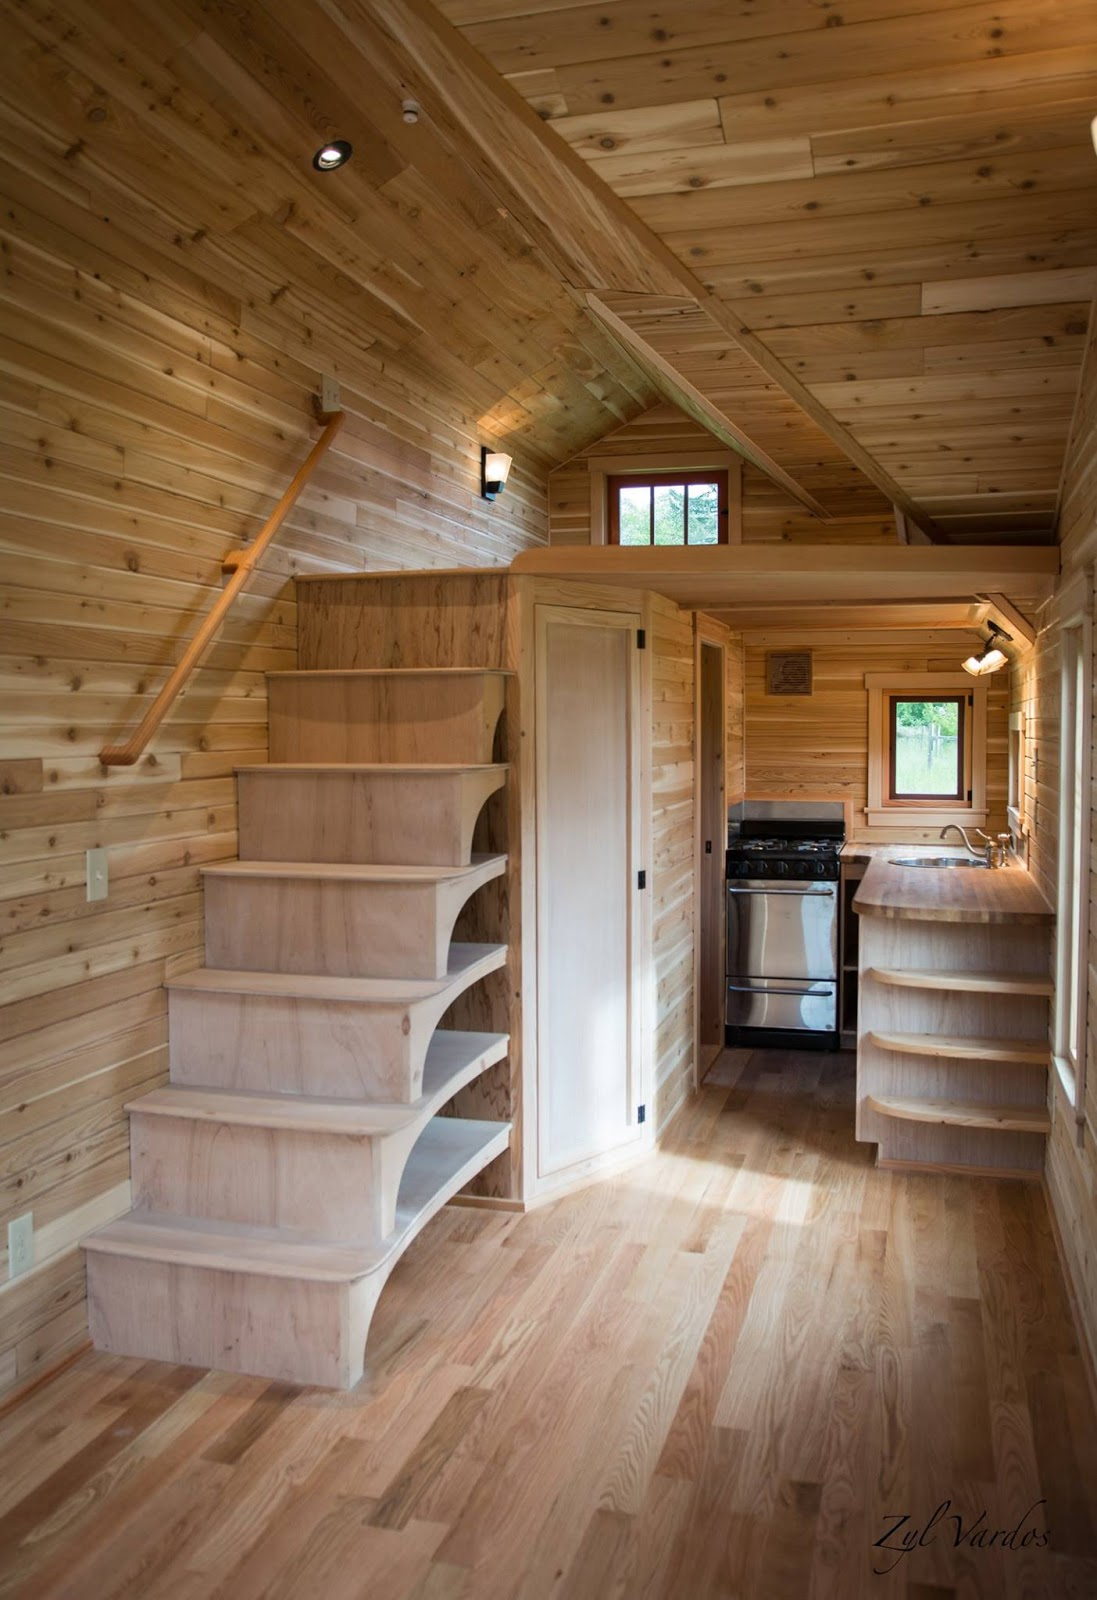 Tiny House Town The Fuchsia By Zyl Vardos